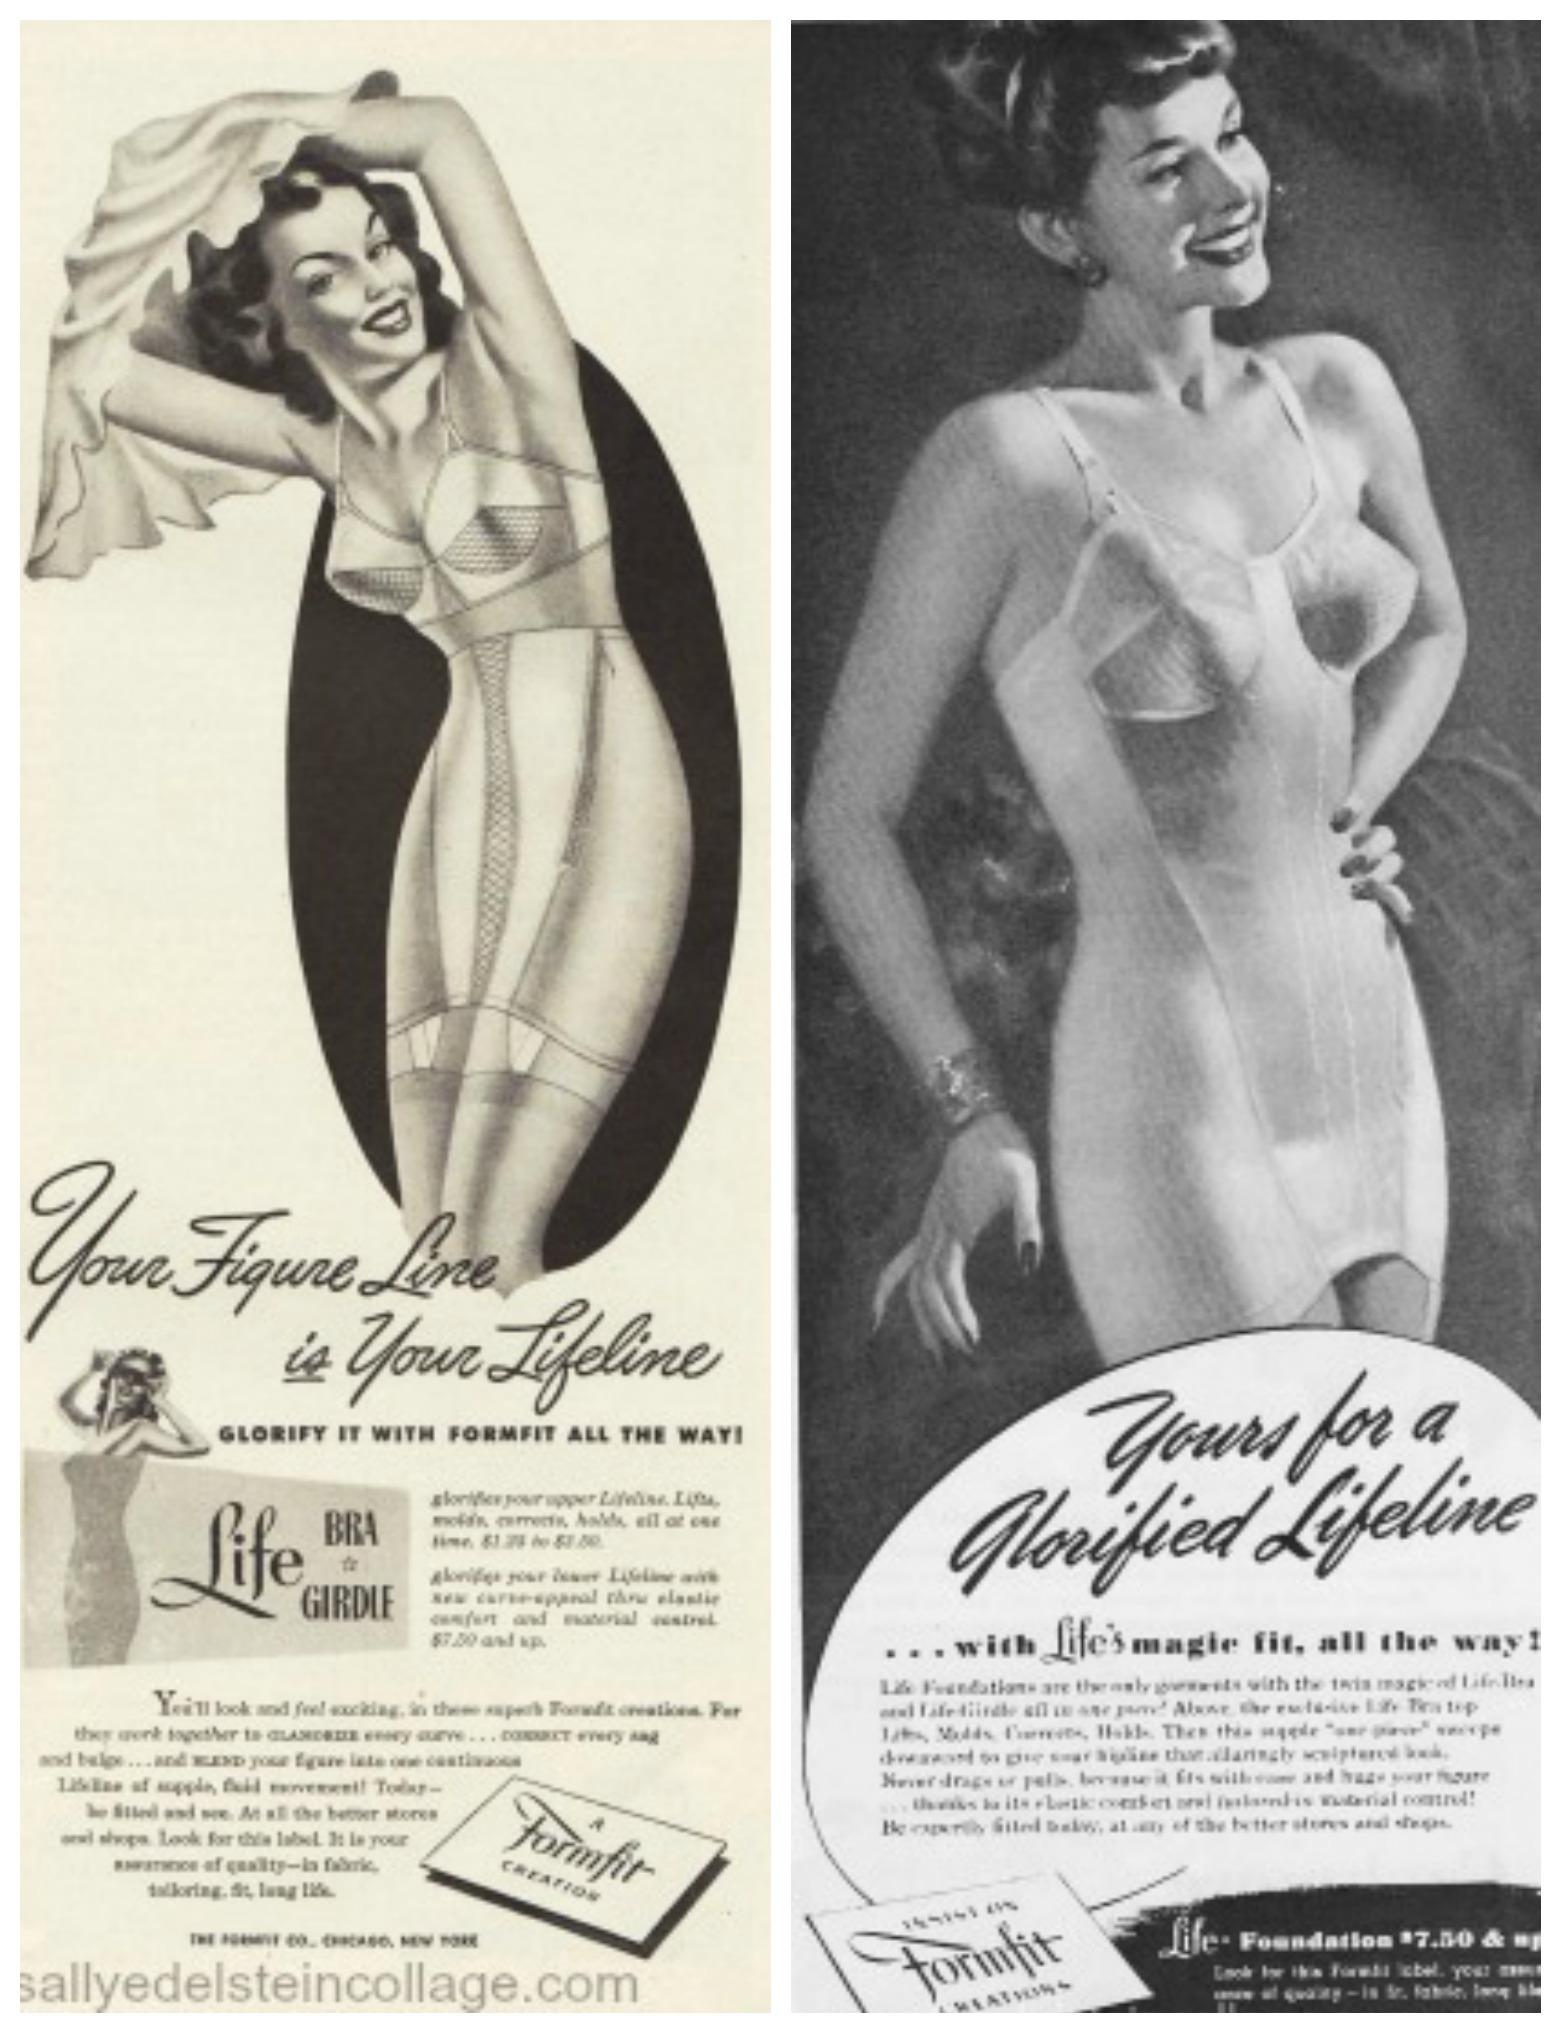 b73ac47a4f71 illustration lingerie bras girdles formfit 1940s ads